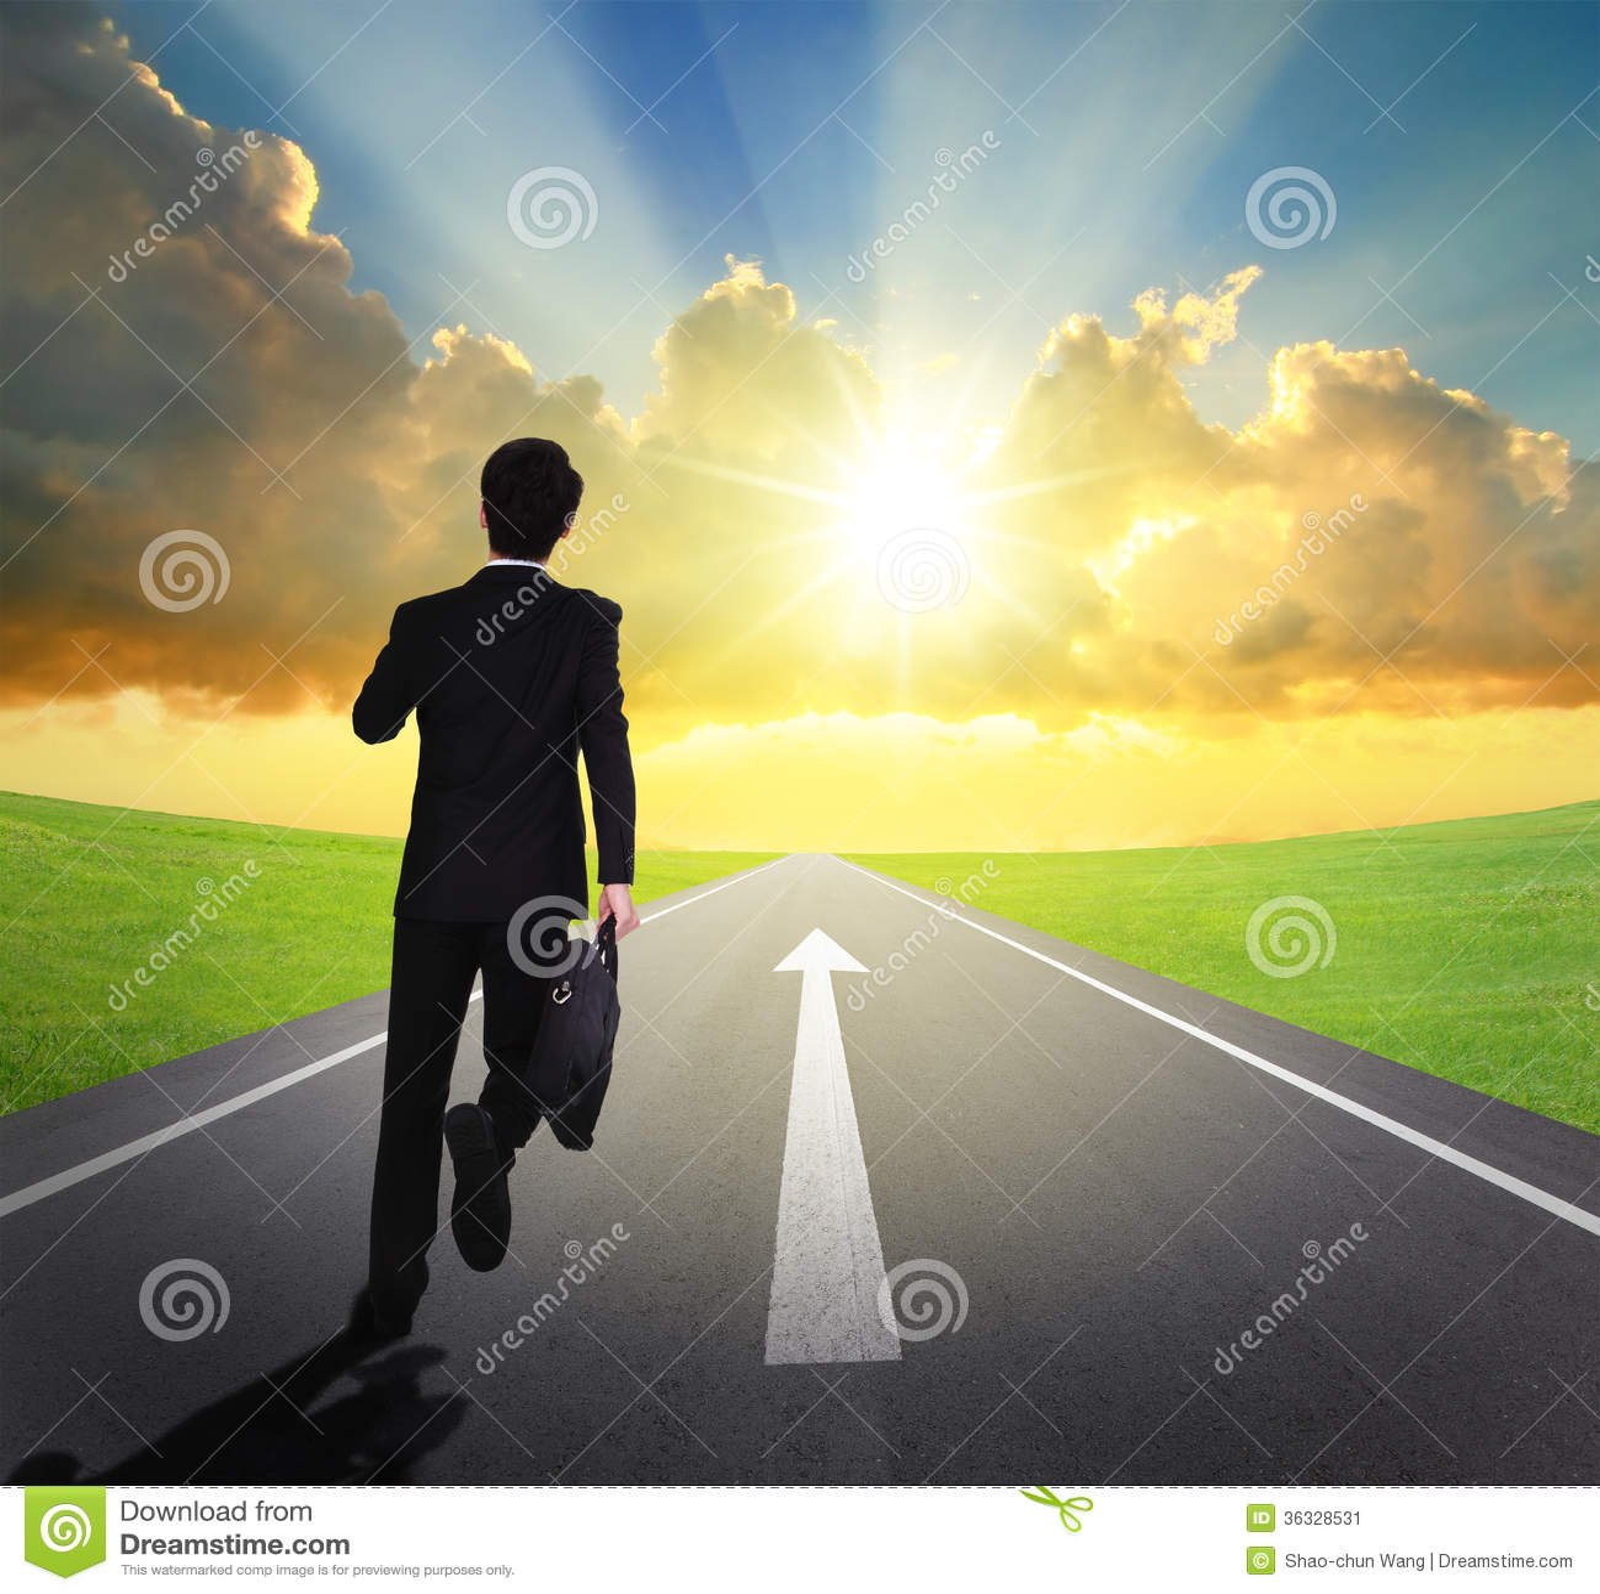 Bedrijfsmens die op asfaltweg loopt